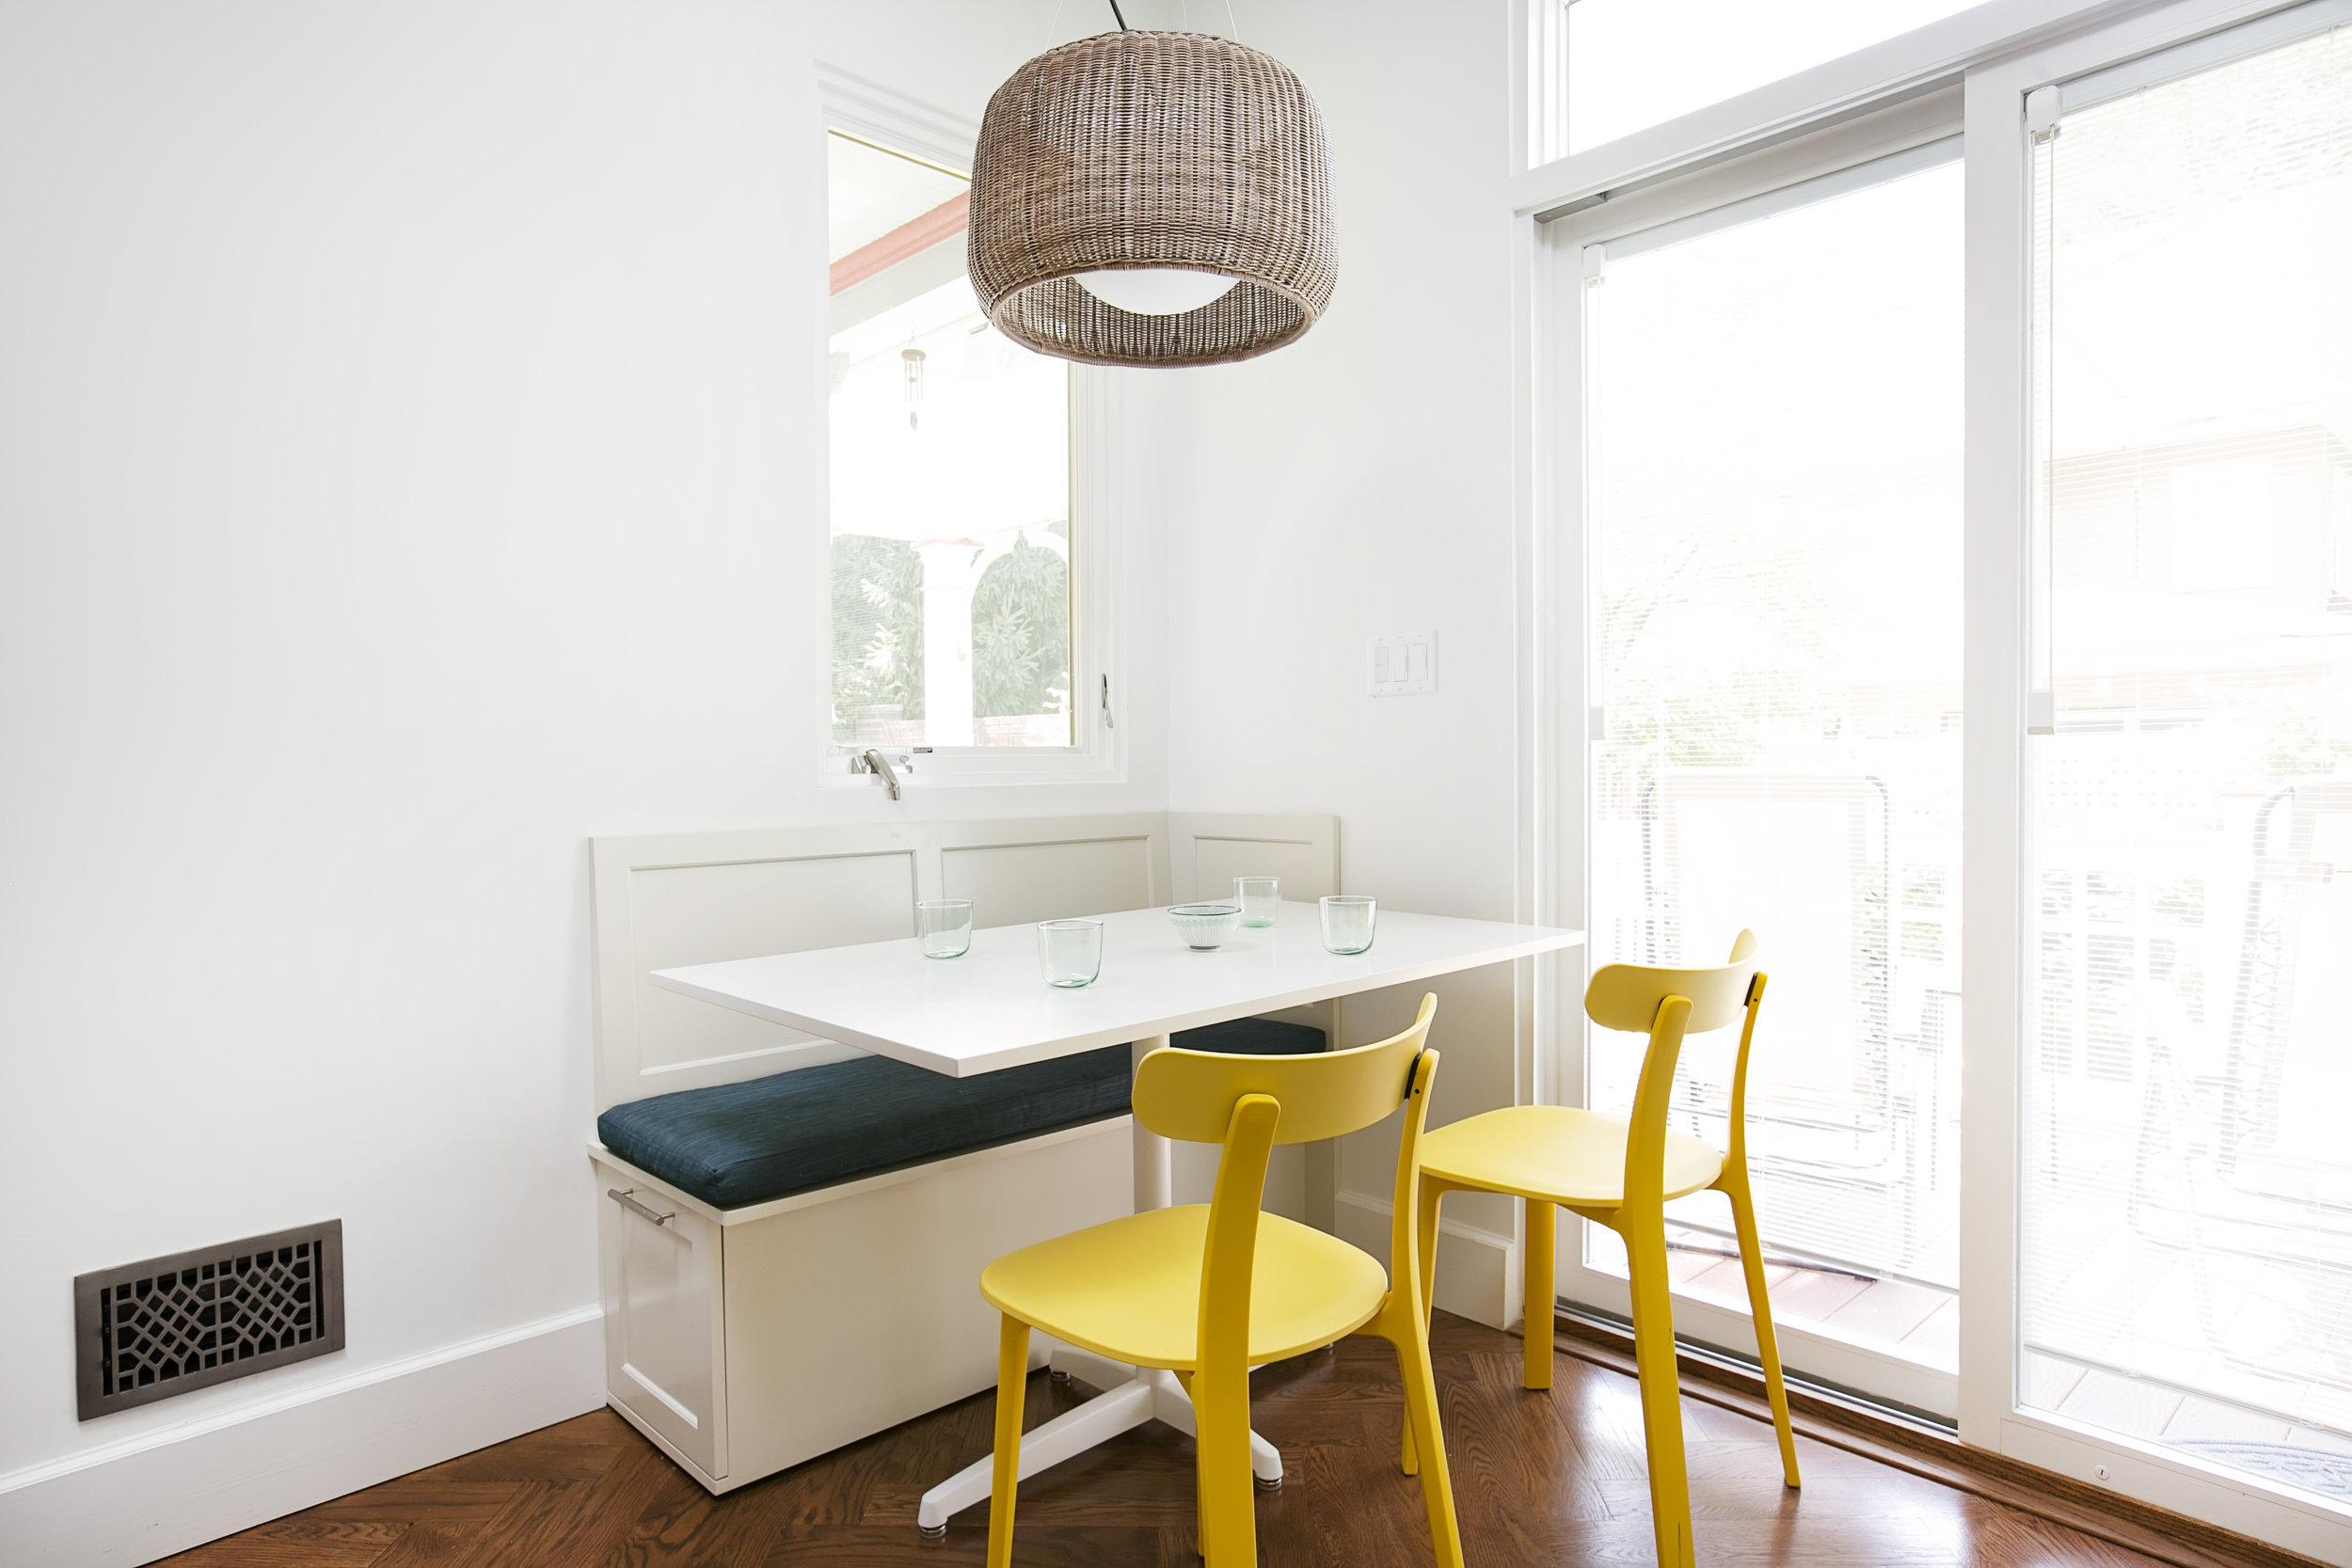 Cozy-Breakfast-Nook-Yellow-Chairs-Pendant-Light.jpg